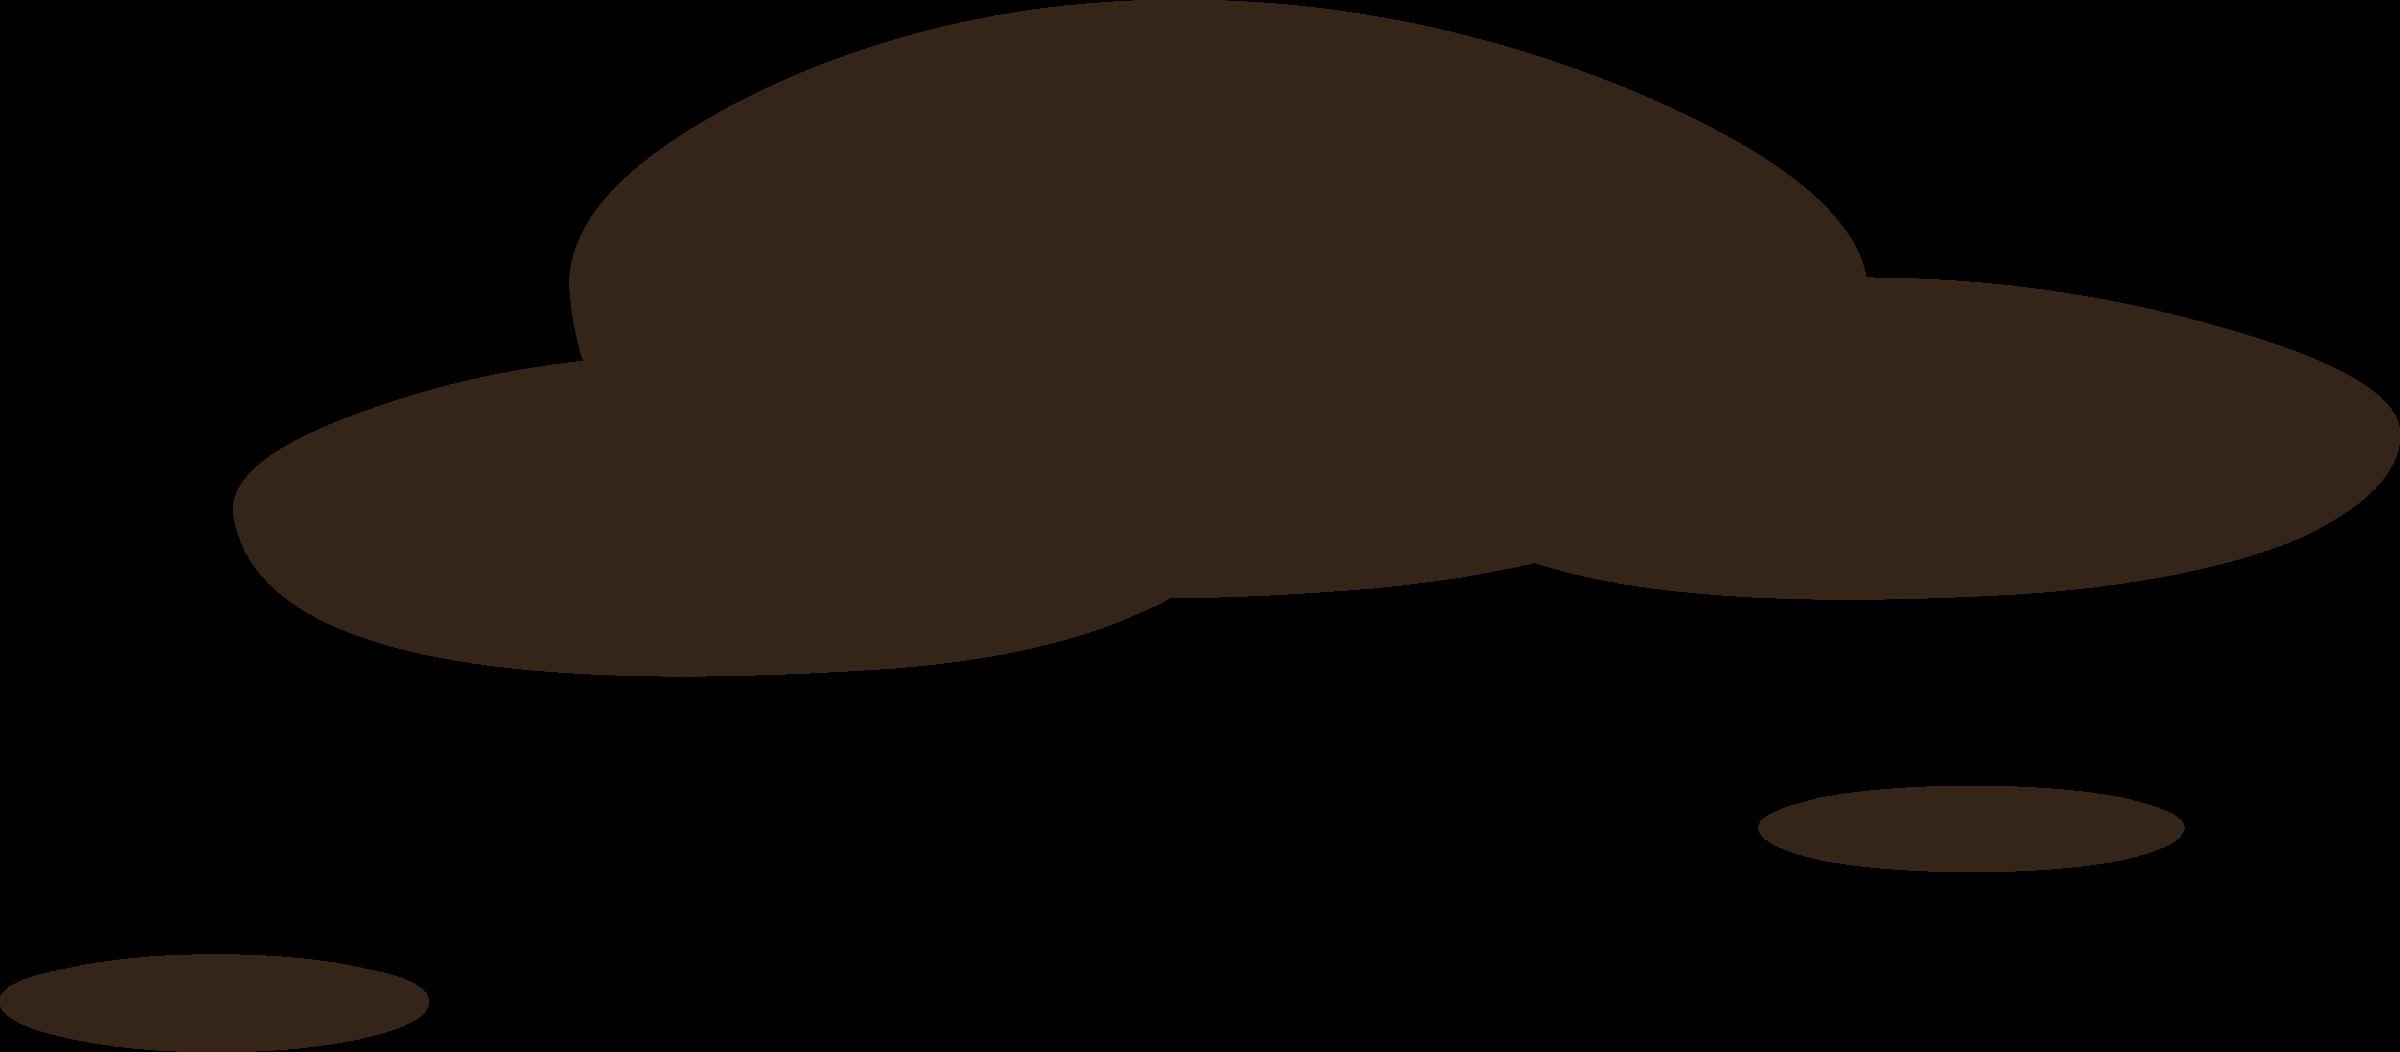 Glitch clipart cartoon Soil Firebog IMAGE (PNG) Debris2